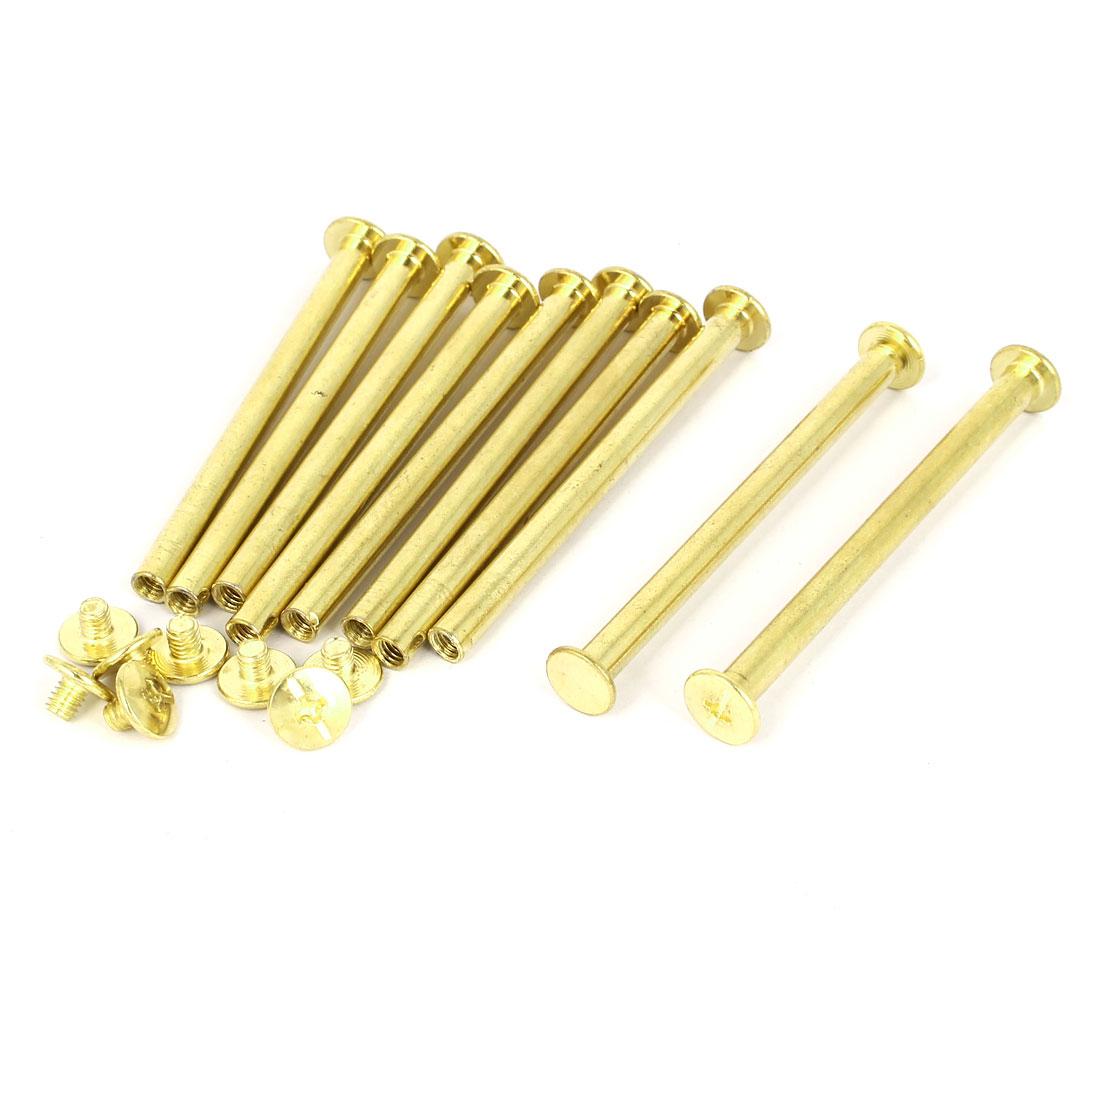 5mmx65mm Brass Plated Chicago Screws Binding Posts Docking Rivet 10pcs